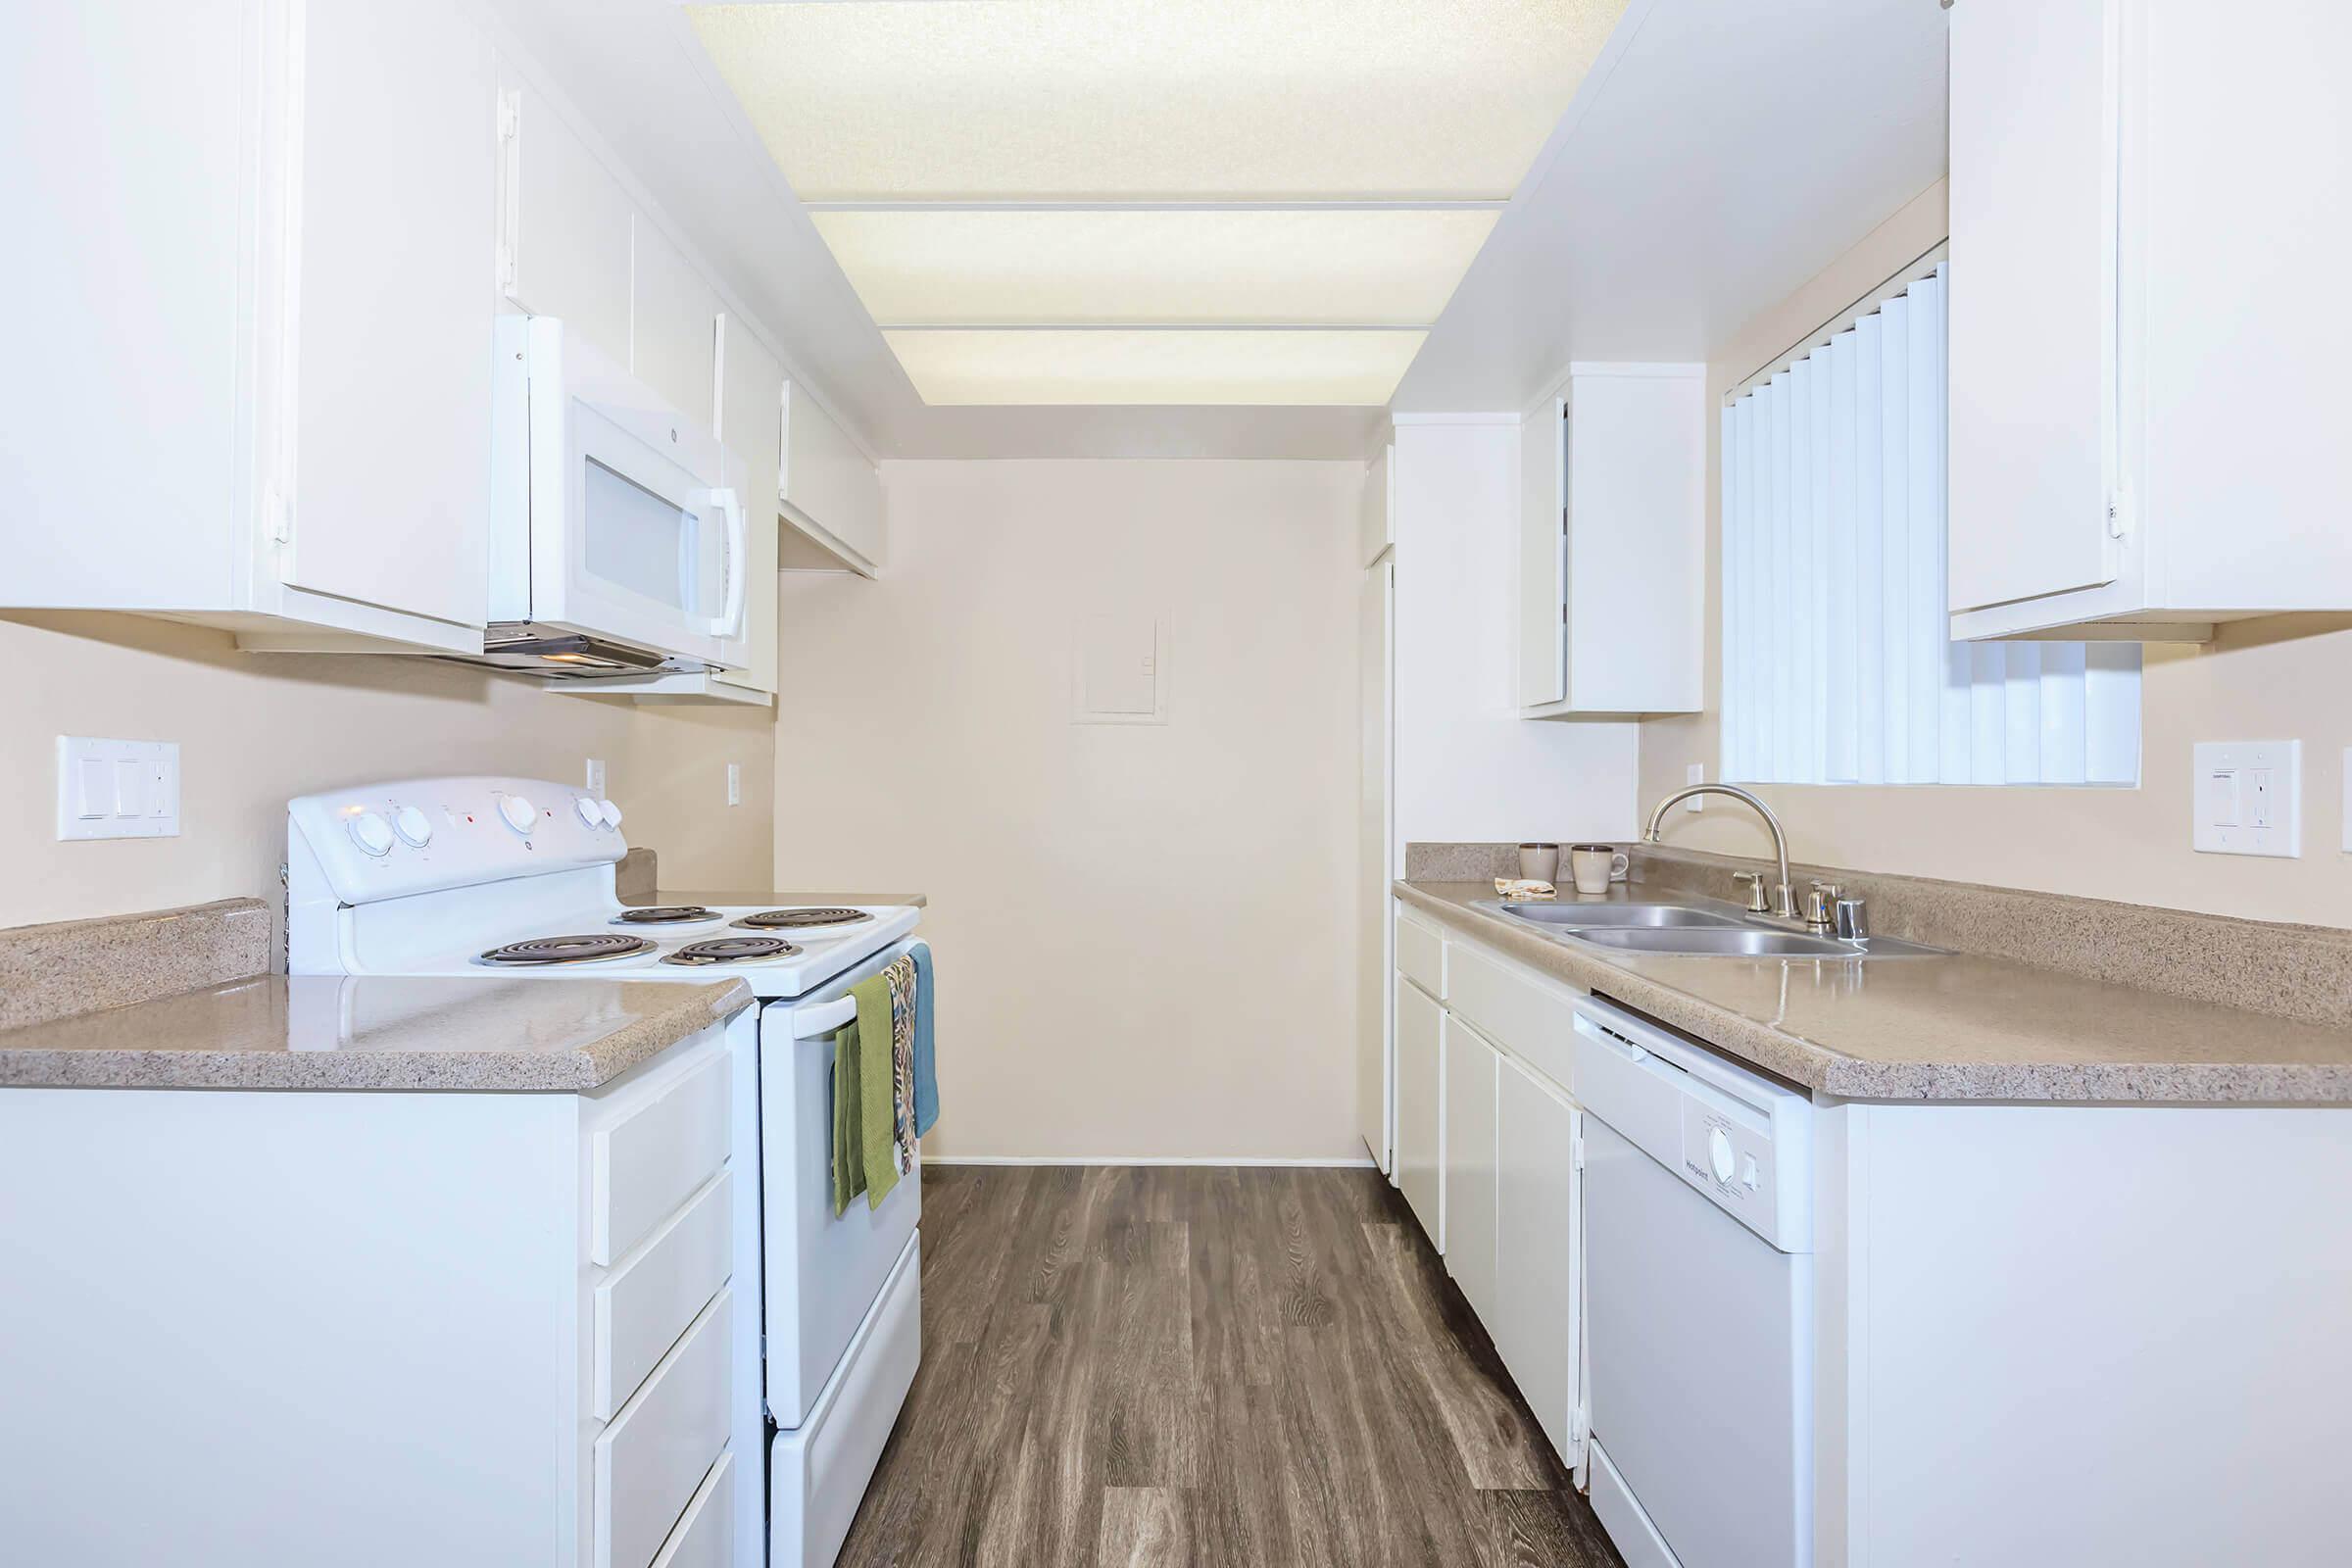 Vacant kitchen